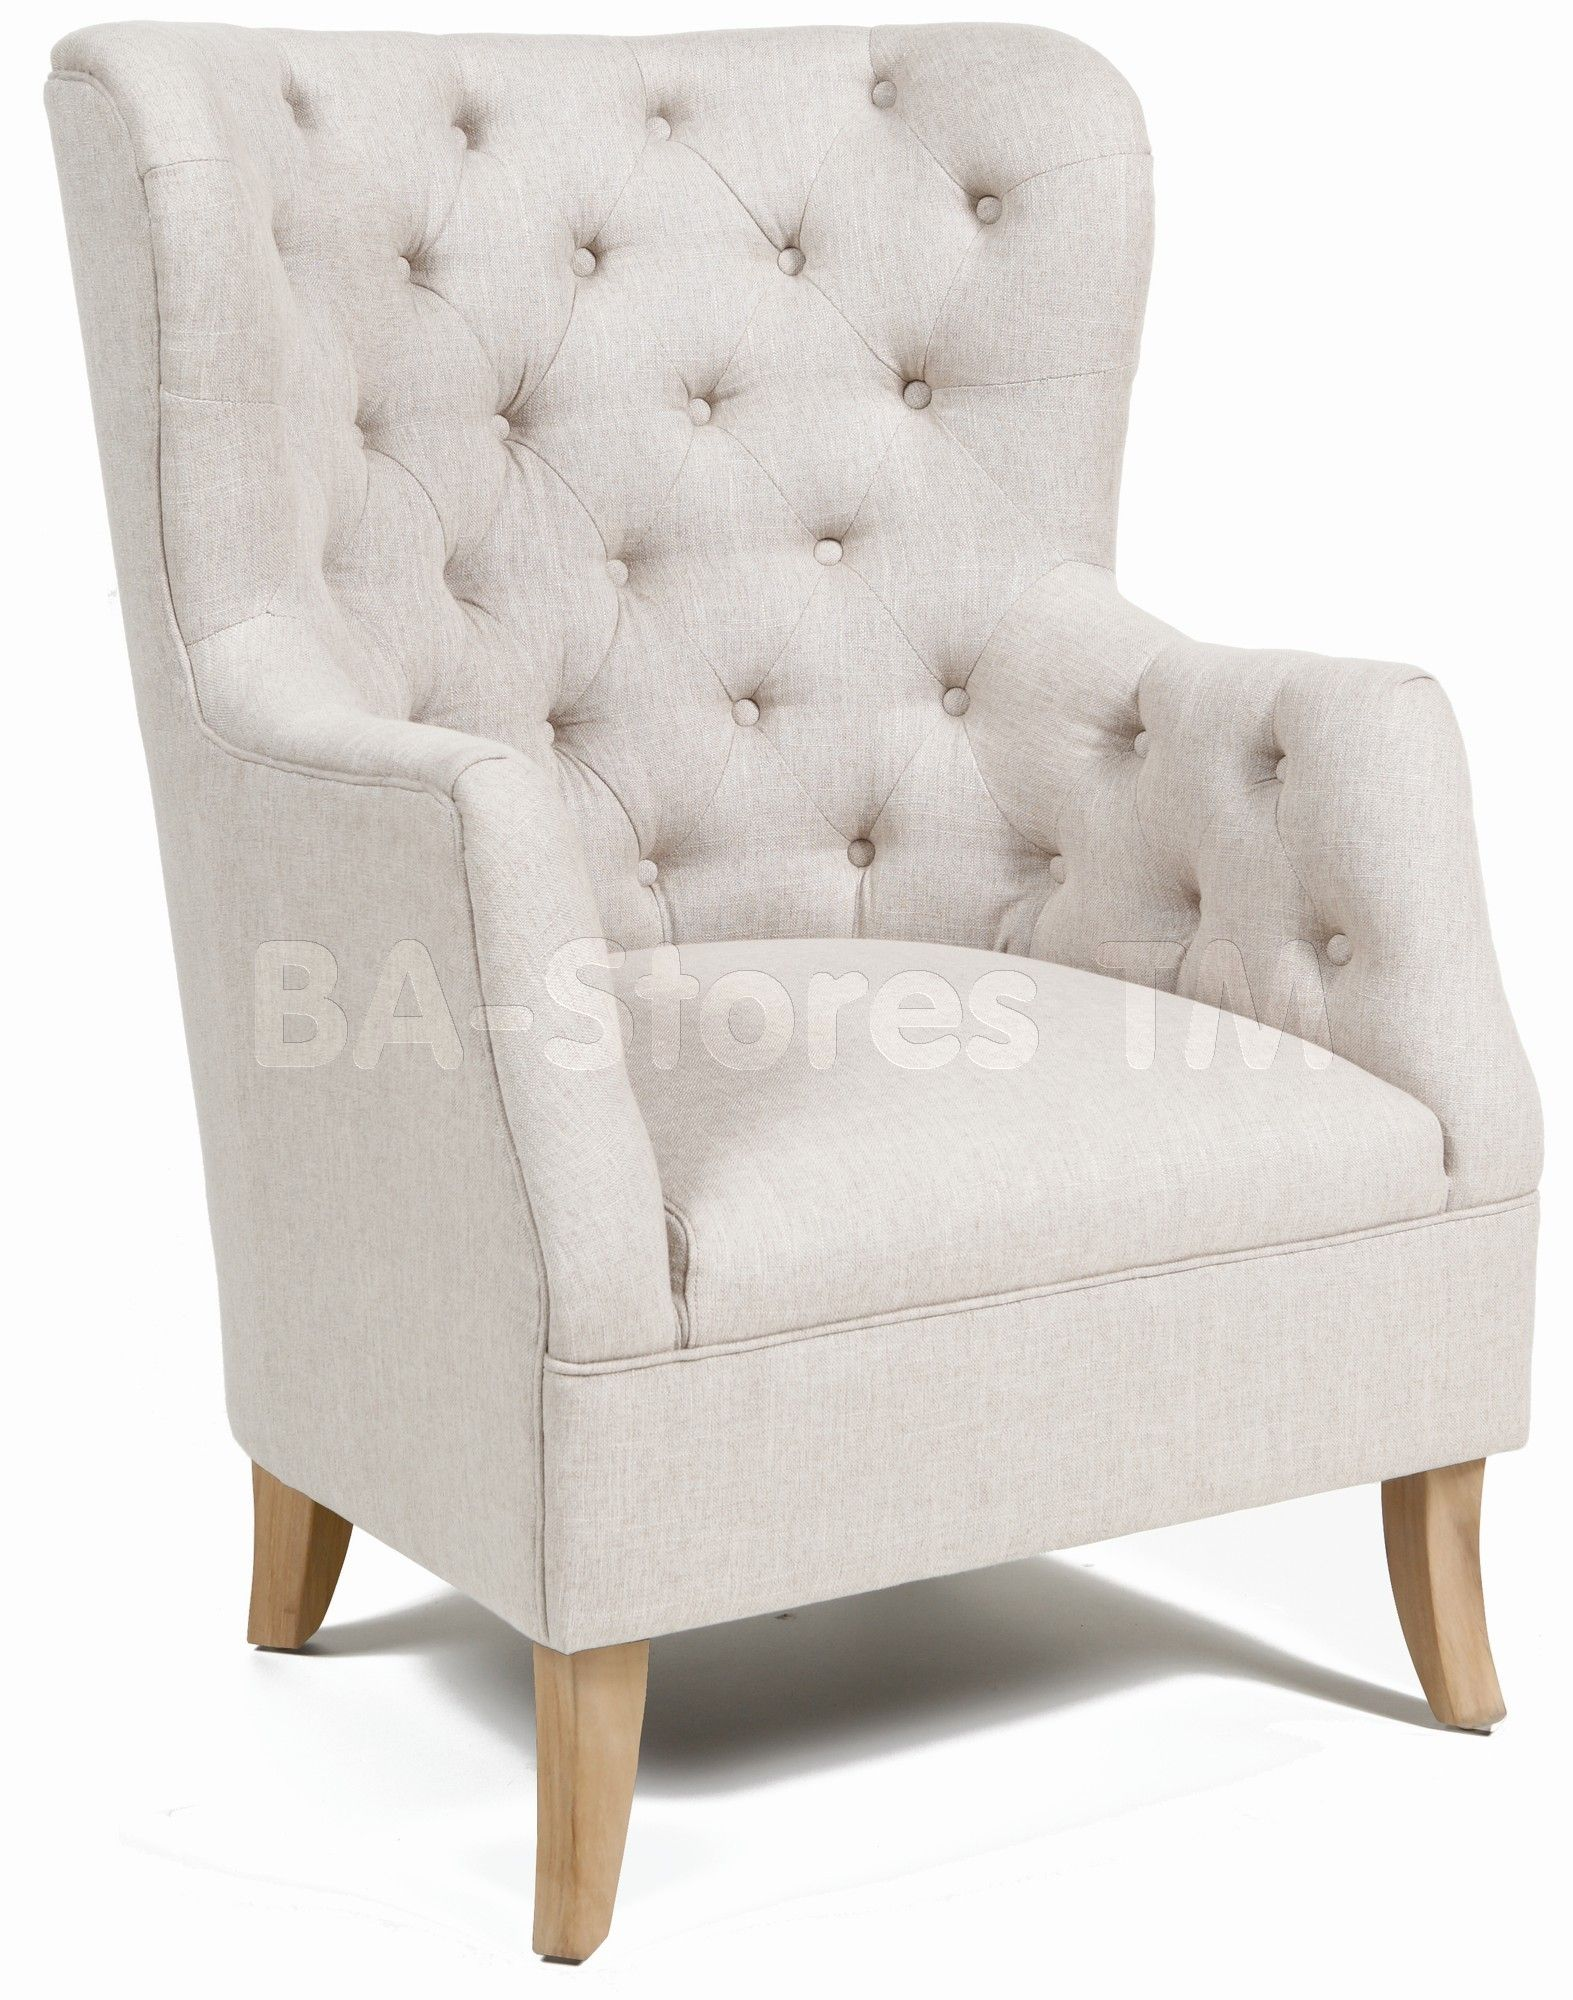 Cafer Light Cream Club Chair | Classic Home Furniture | Pinterest ...